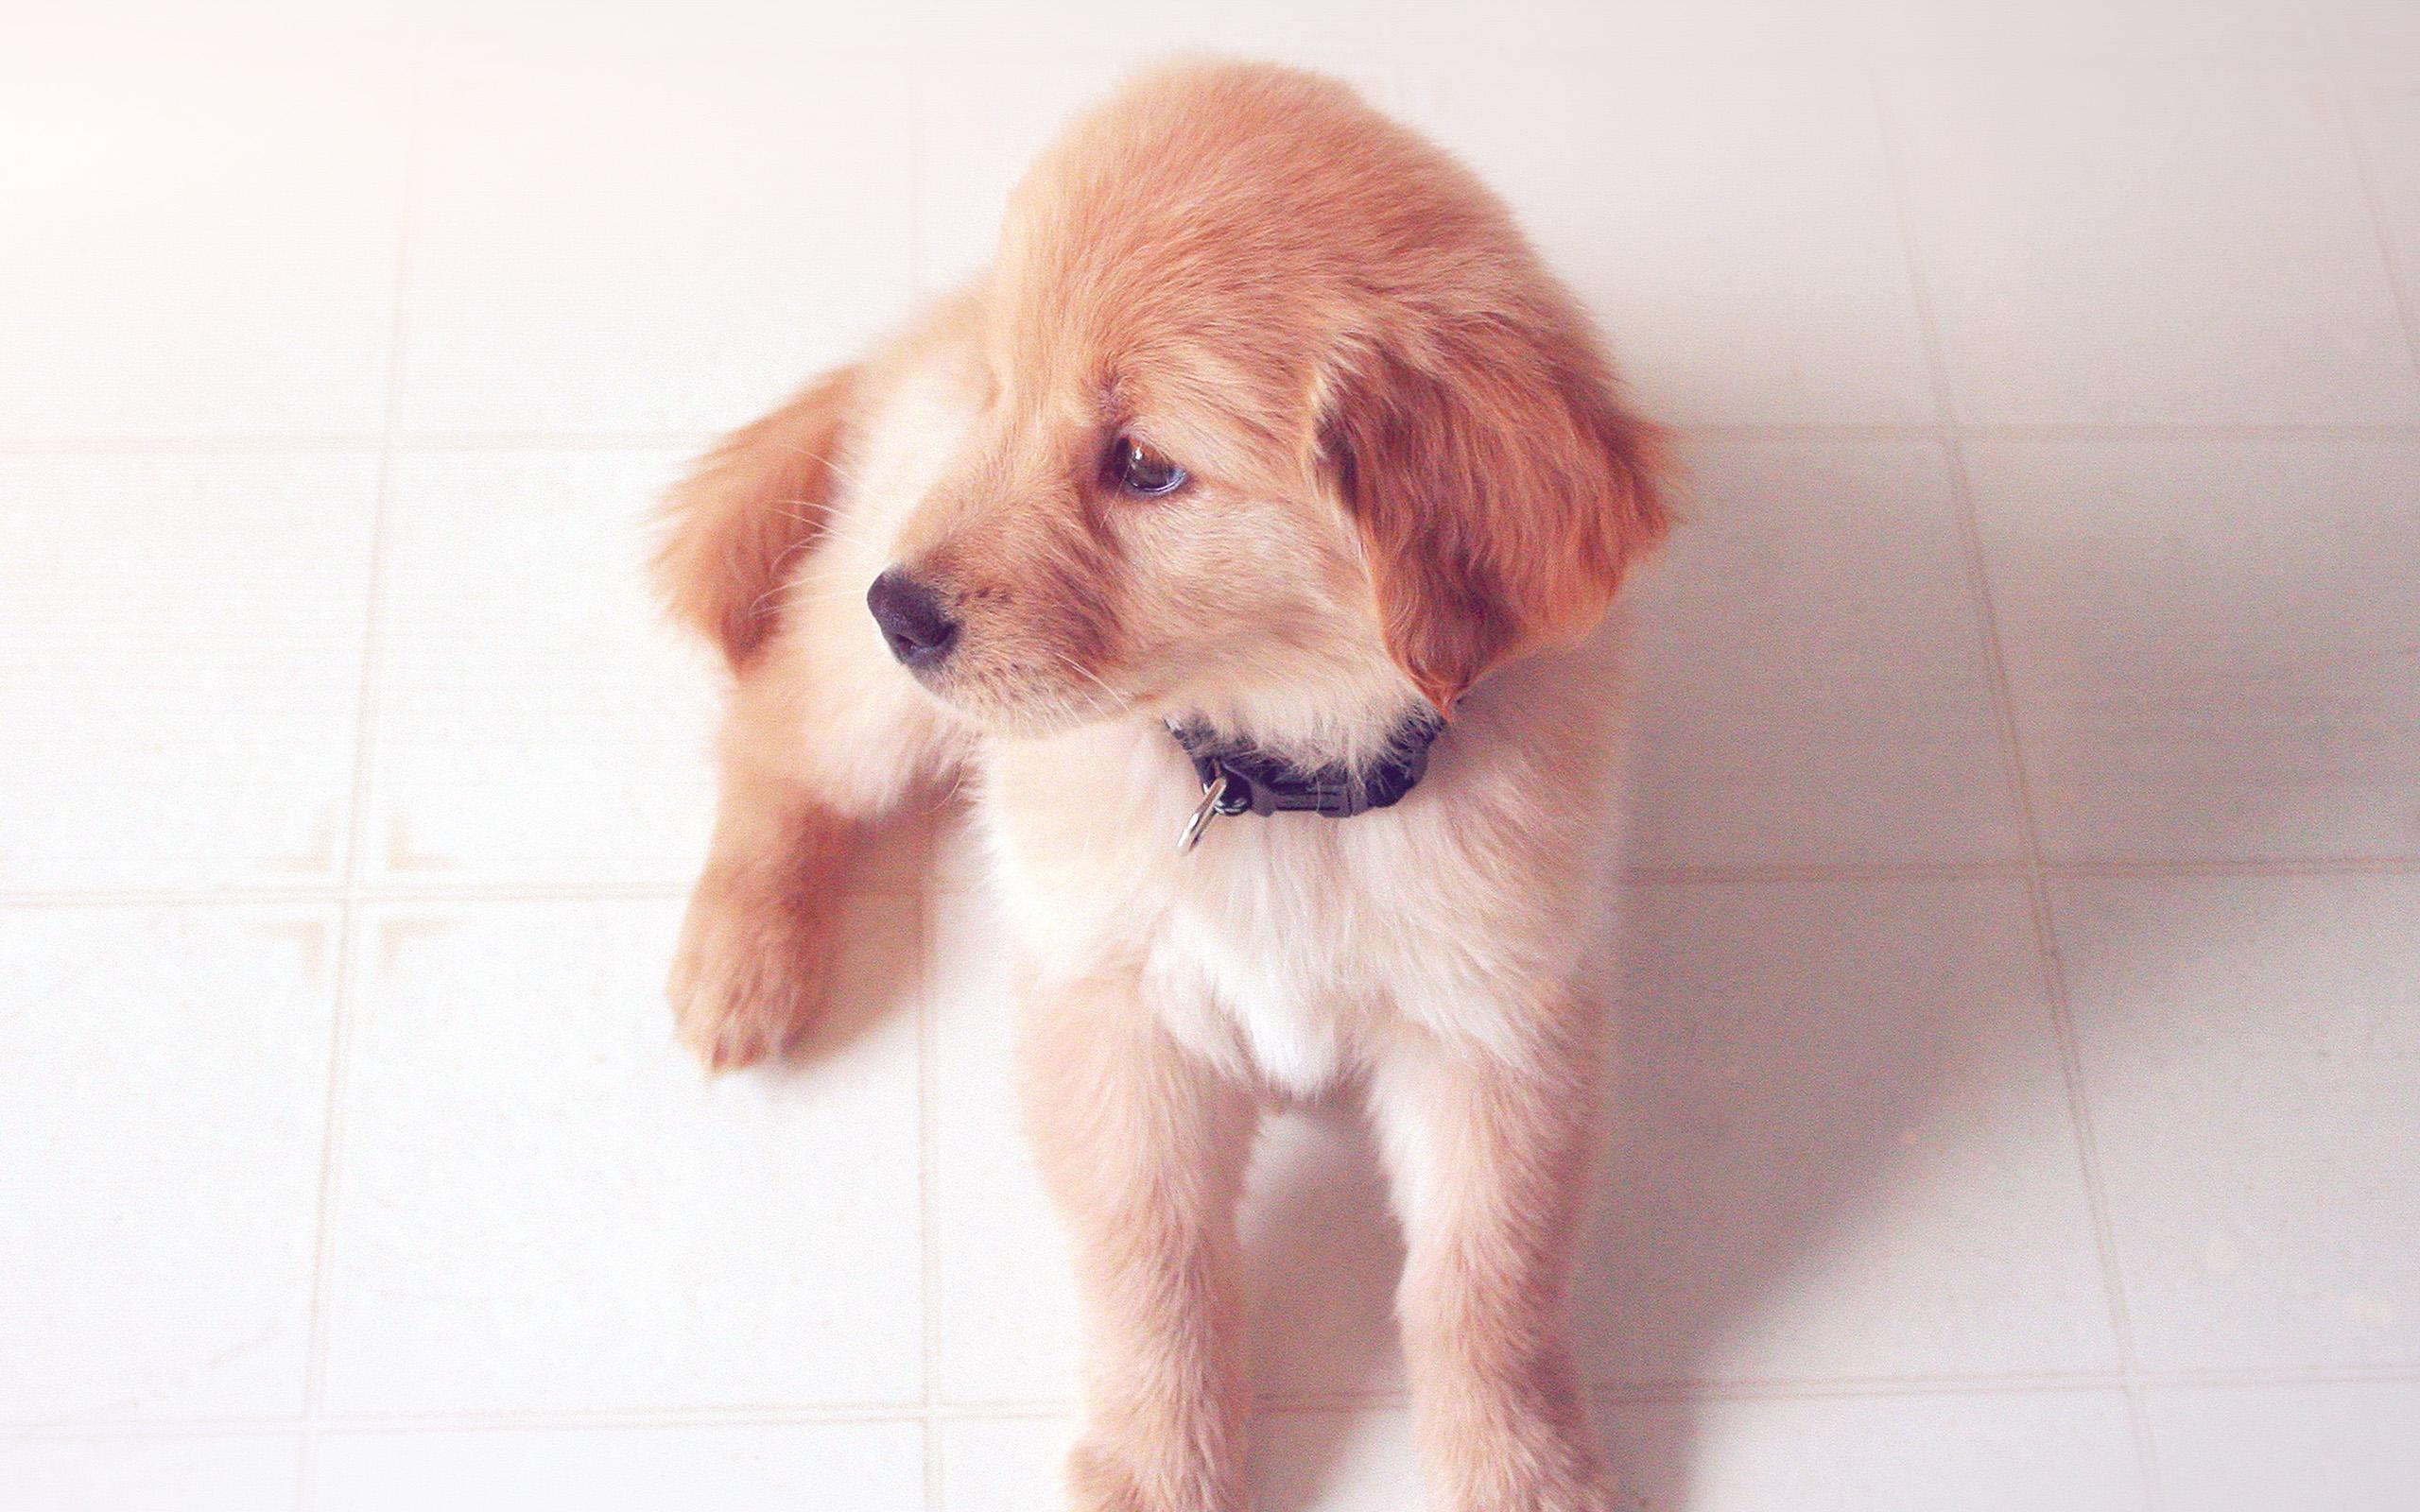 Cute Dog Wallpapers Fot Google Mv00 Puppy Love Cute Animal Nature Sitting Dog Blue Wallpaper